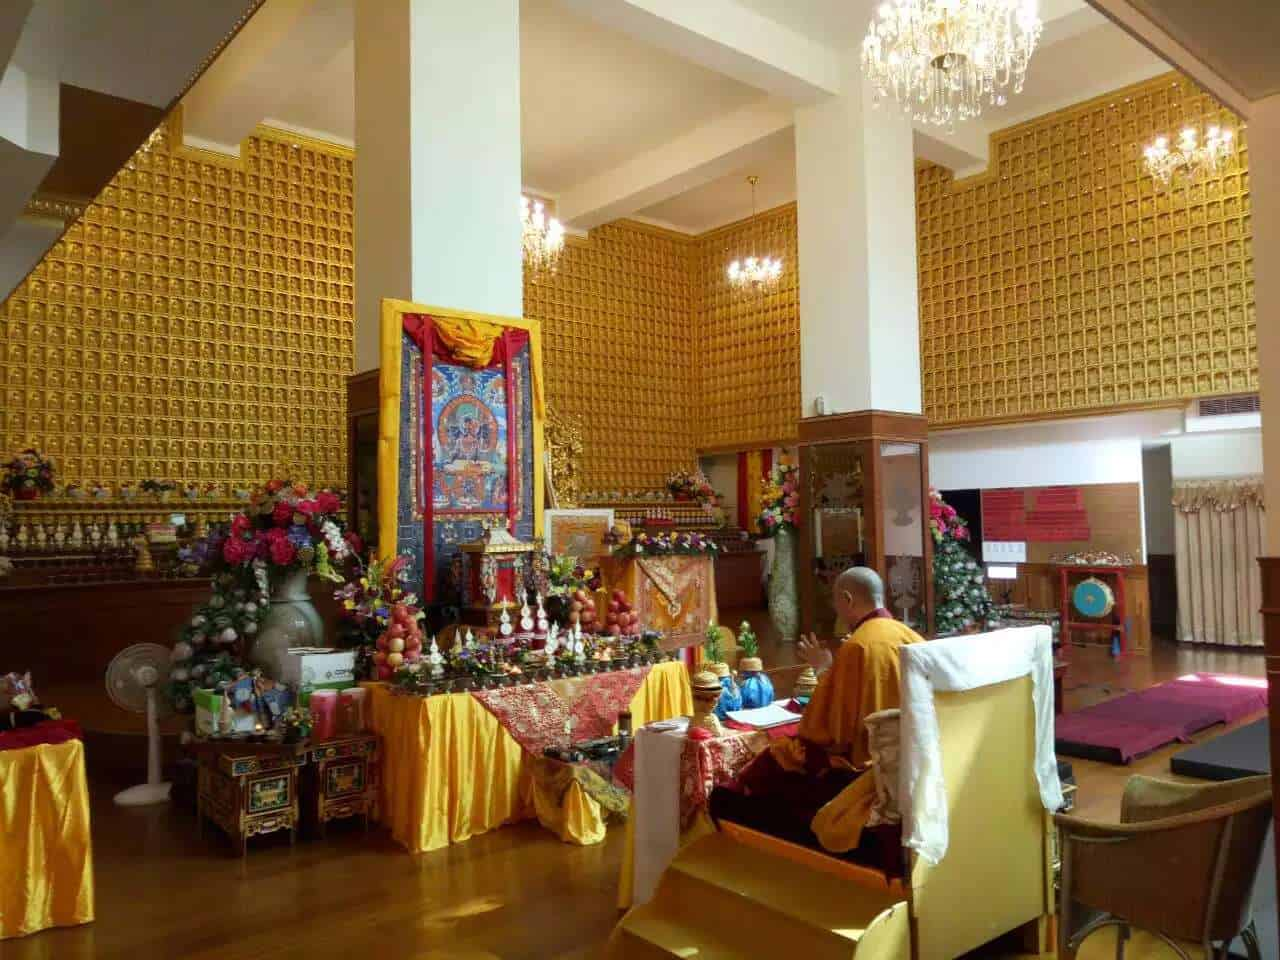 gosok-rinpoche-2016-10-637228642212848021